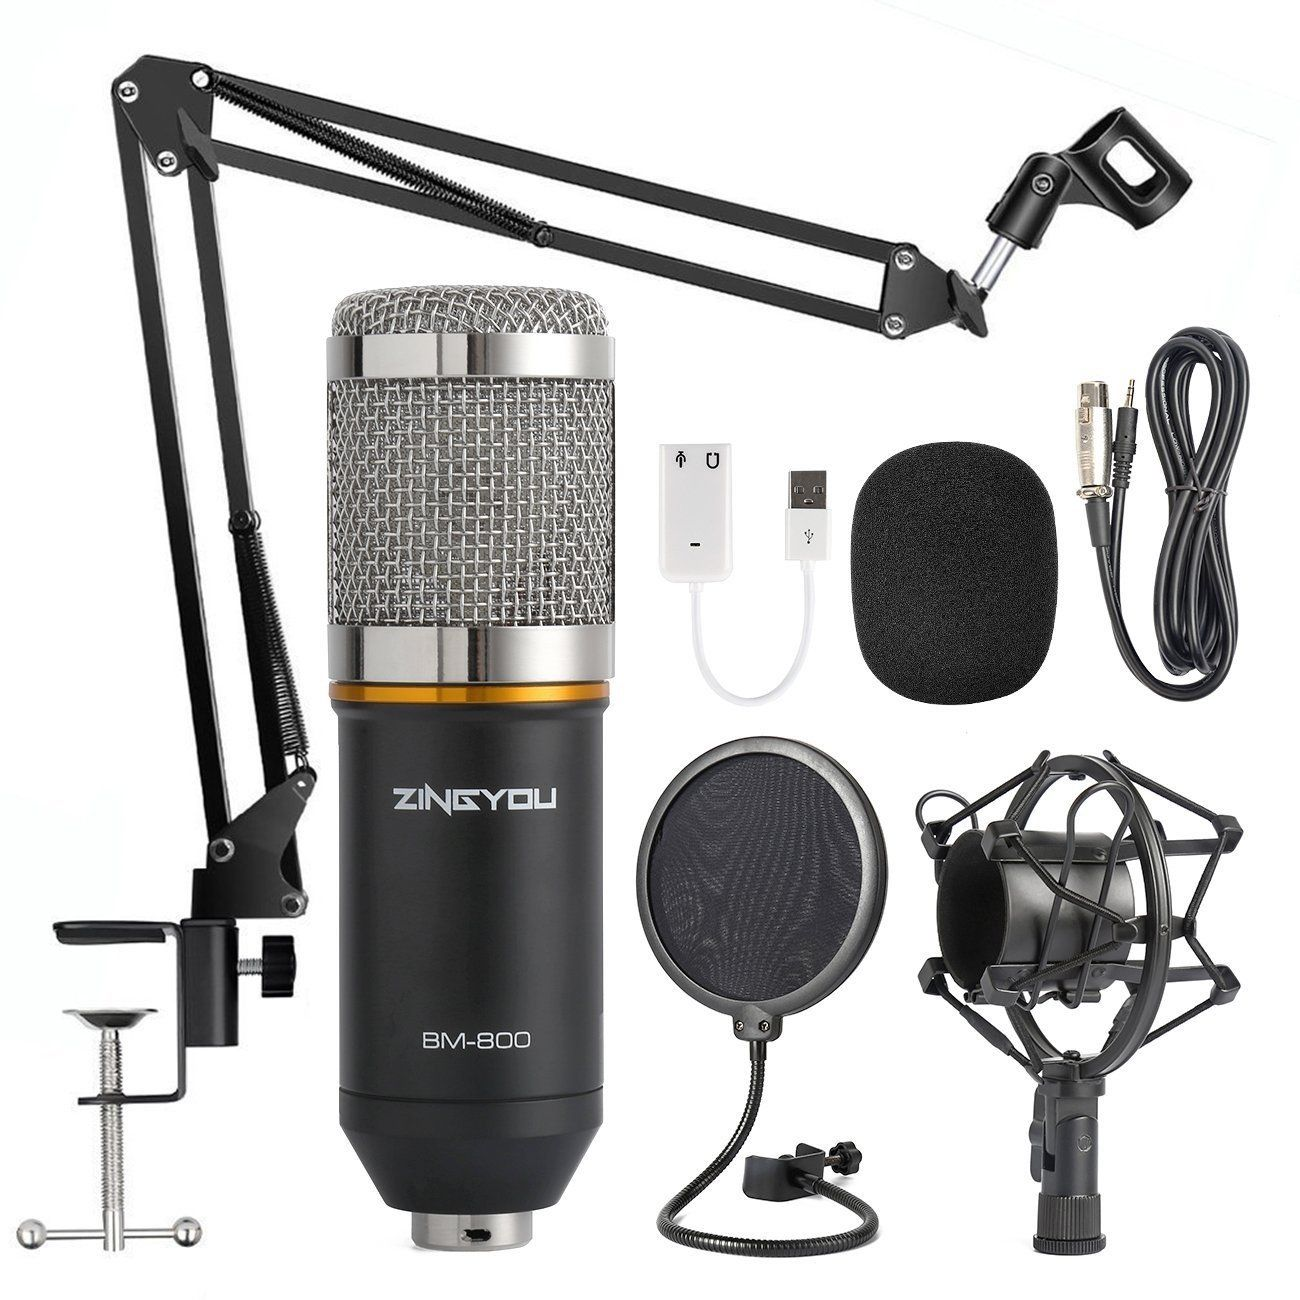 Bm800 Professional Condenser Microphone Pro Audio Studio Sound Recording Brocasting Arm Stand Pop Filter Microphone Studio Microphone Microphone Set